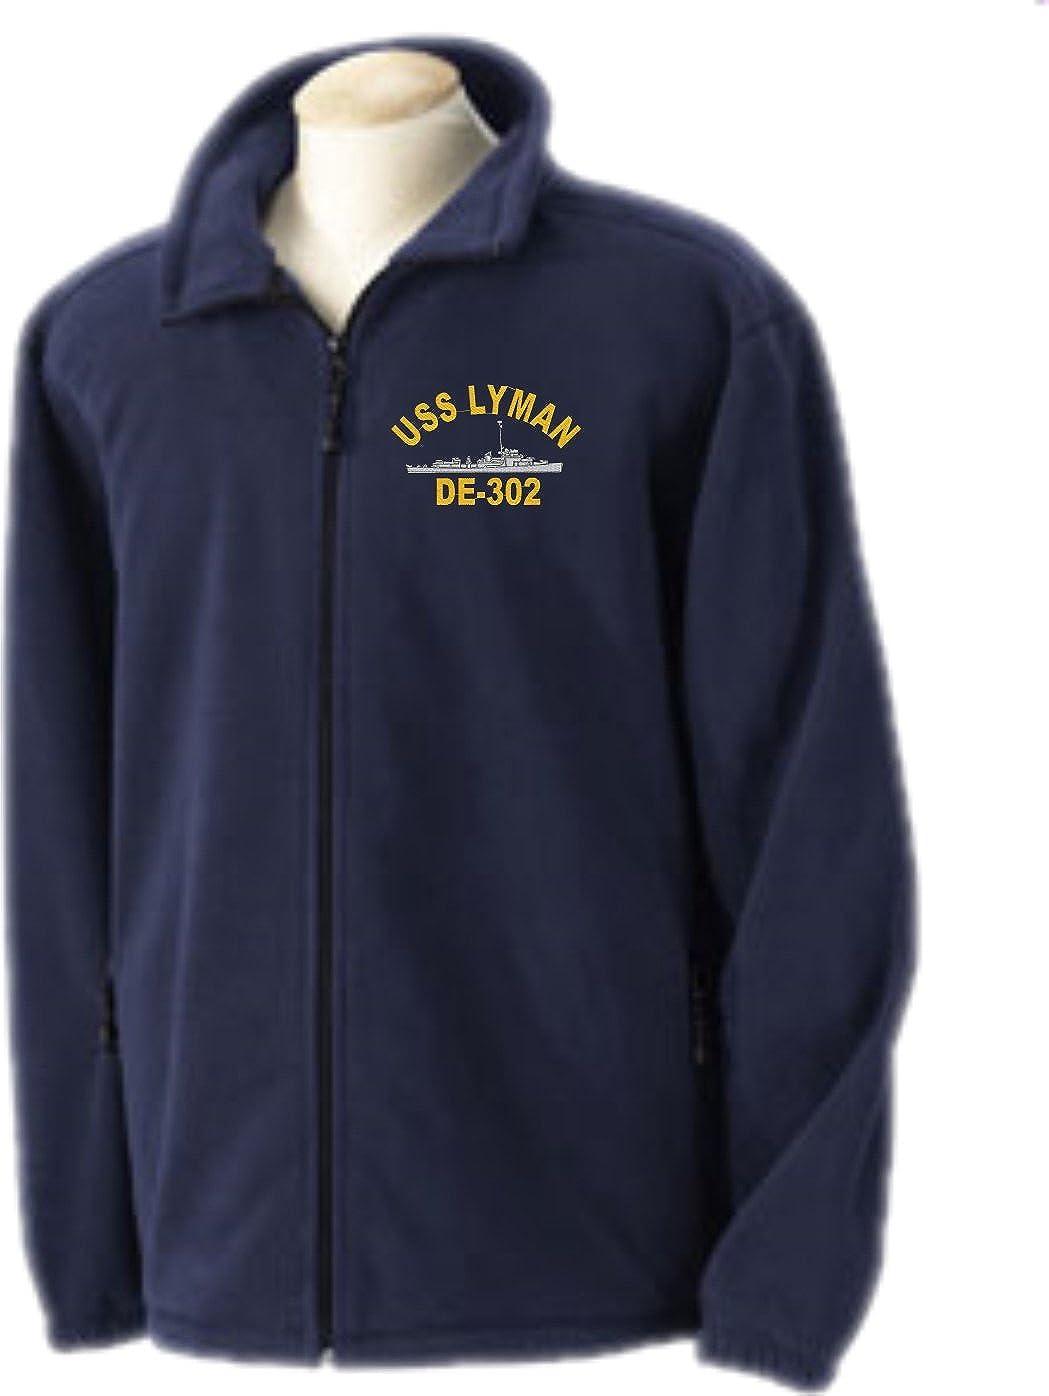 Custom Military Apparel USS Lyman DE-302 Embroidered Fleece Jacket Sizes SMALL-4X